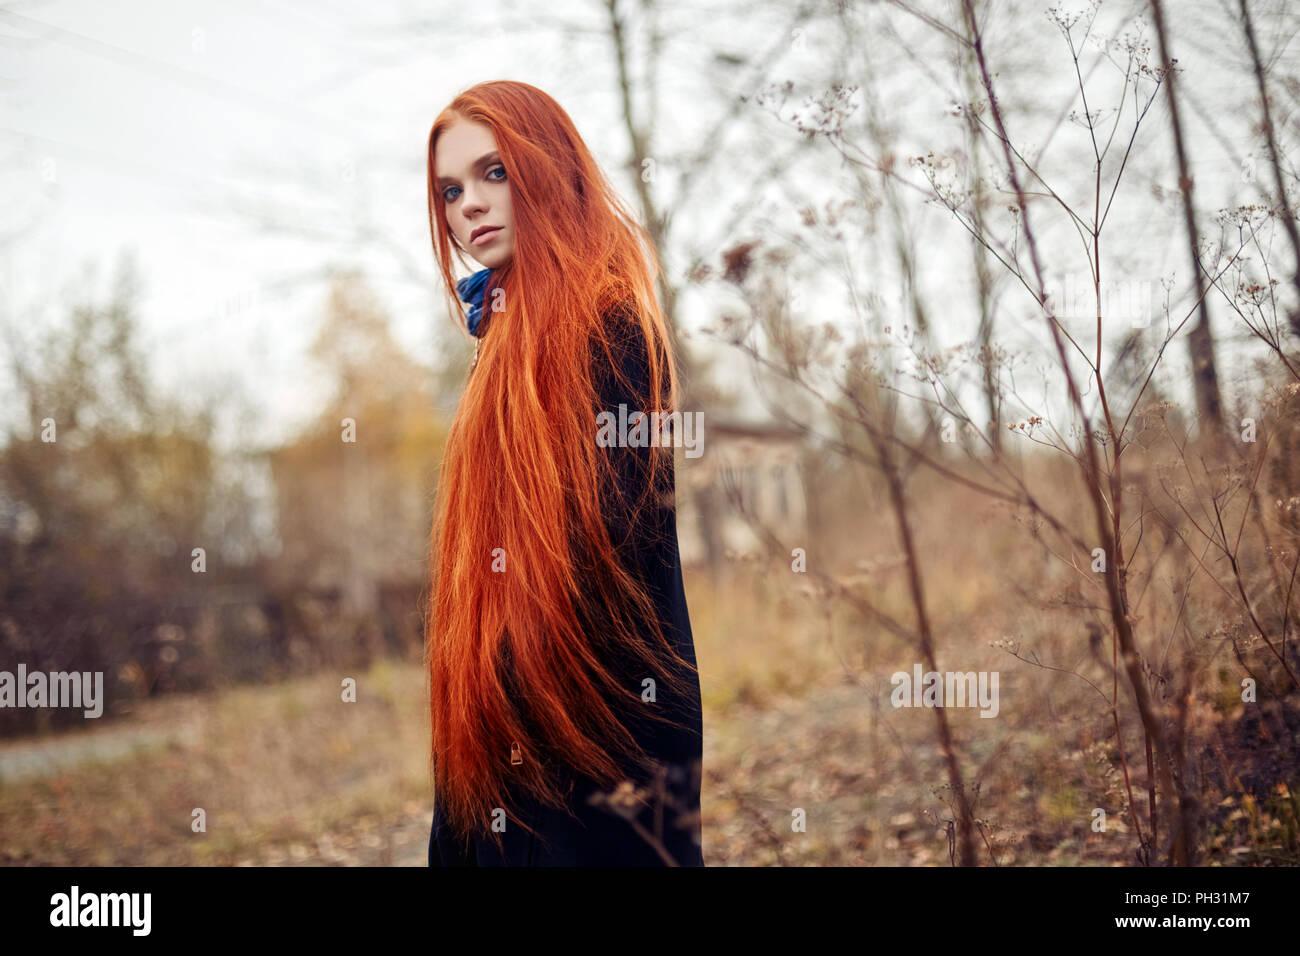 Are hair long red redhead good idea